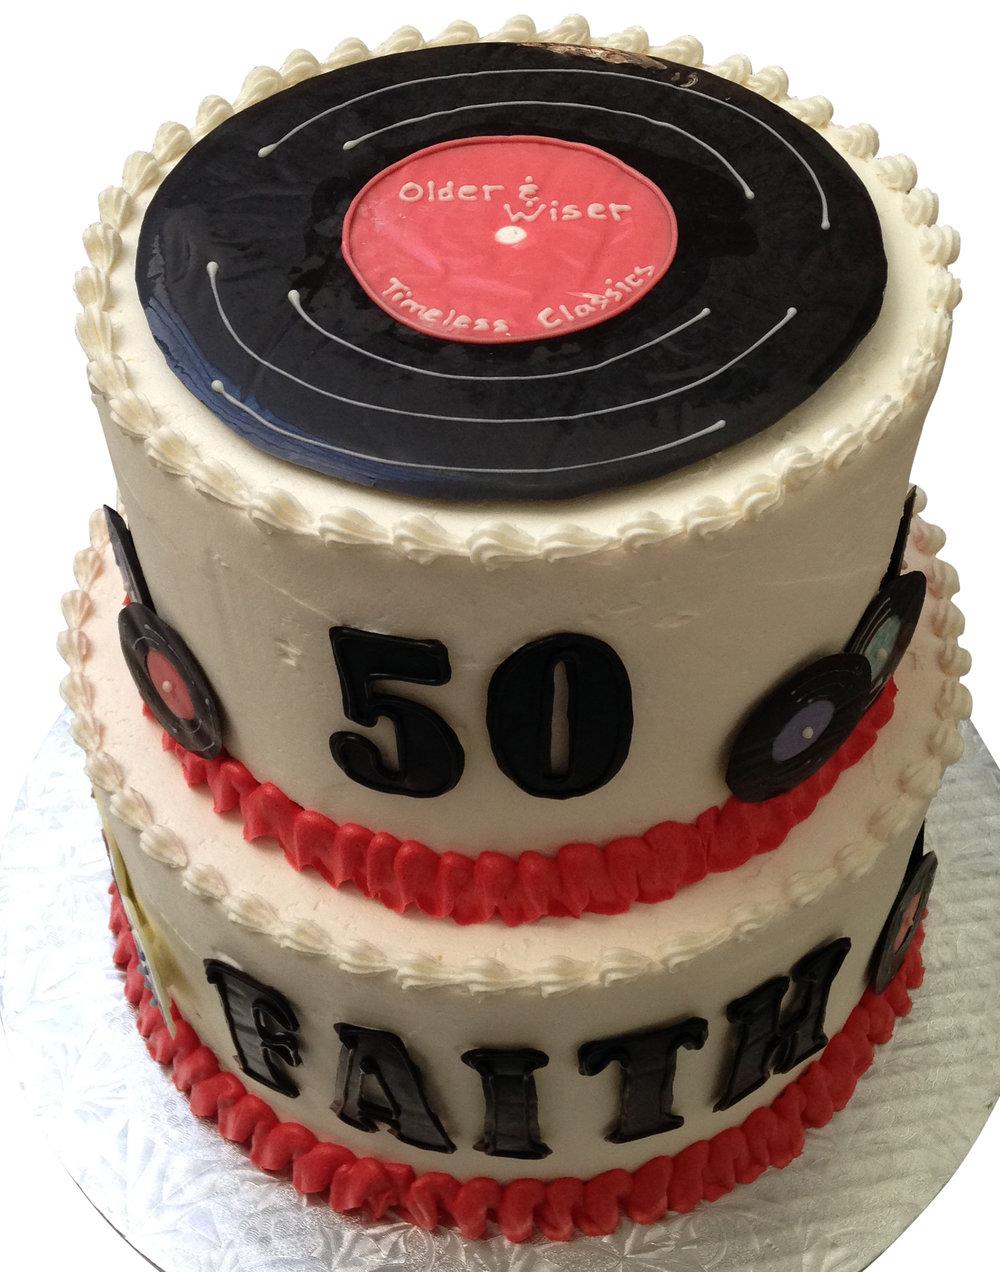 BeBe-Cakes-Music-Record-Cake.JPG